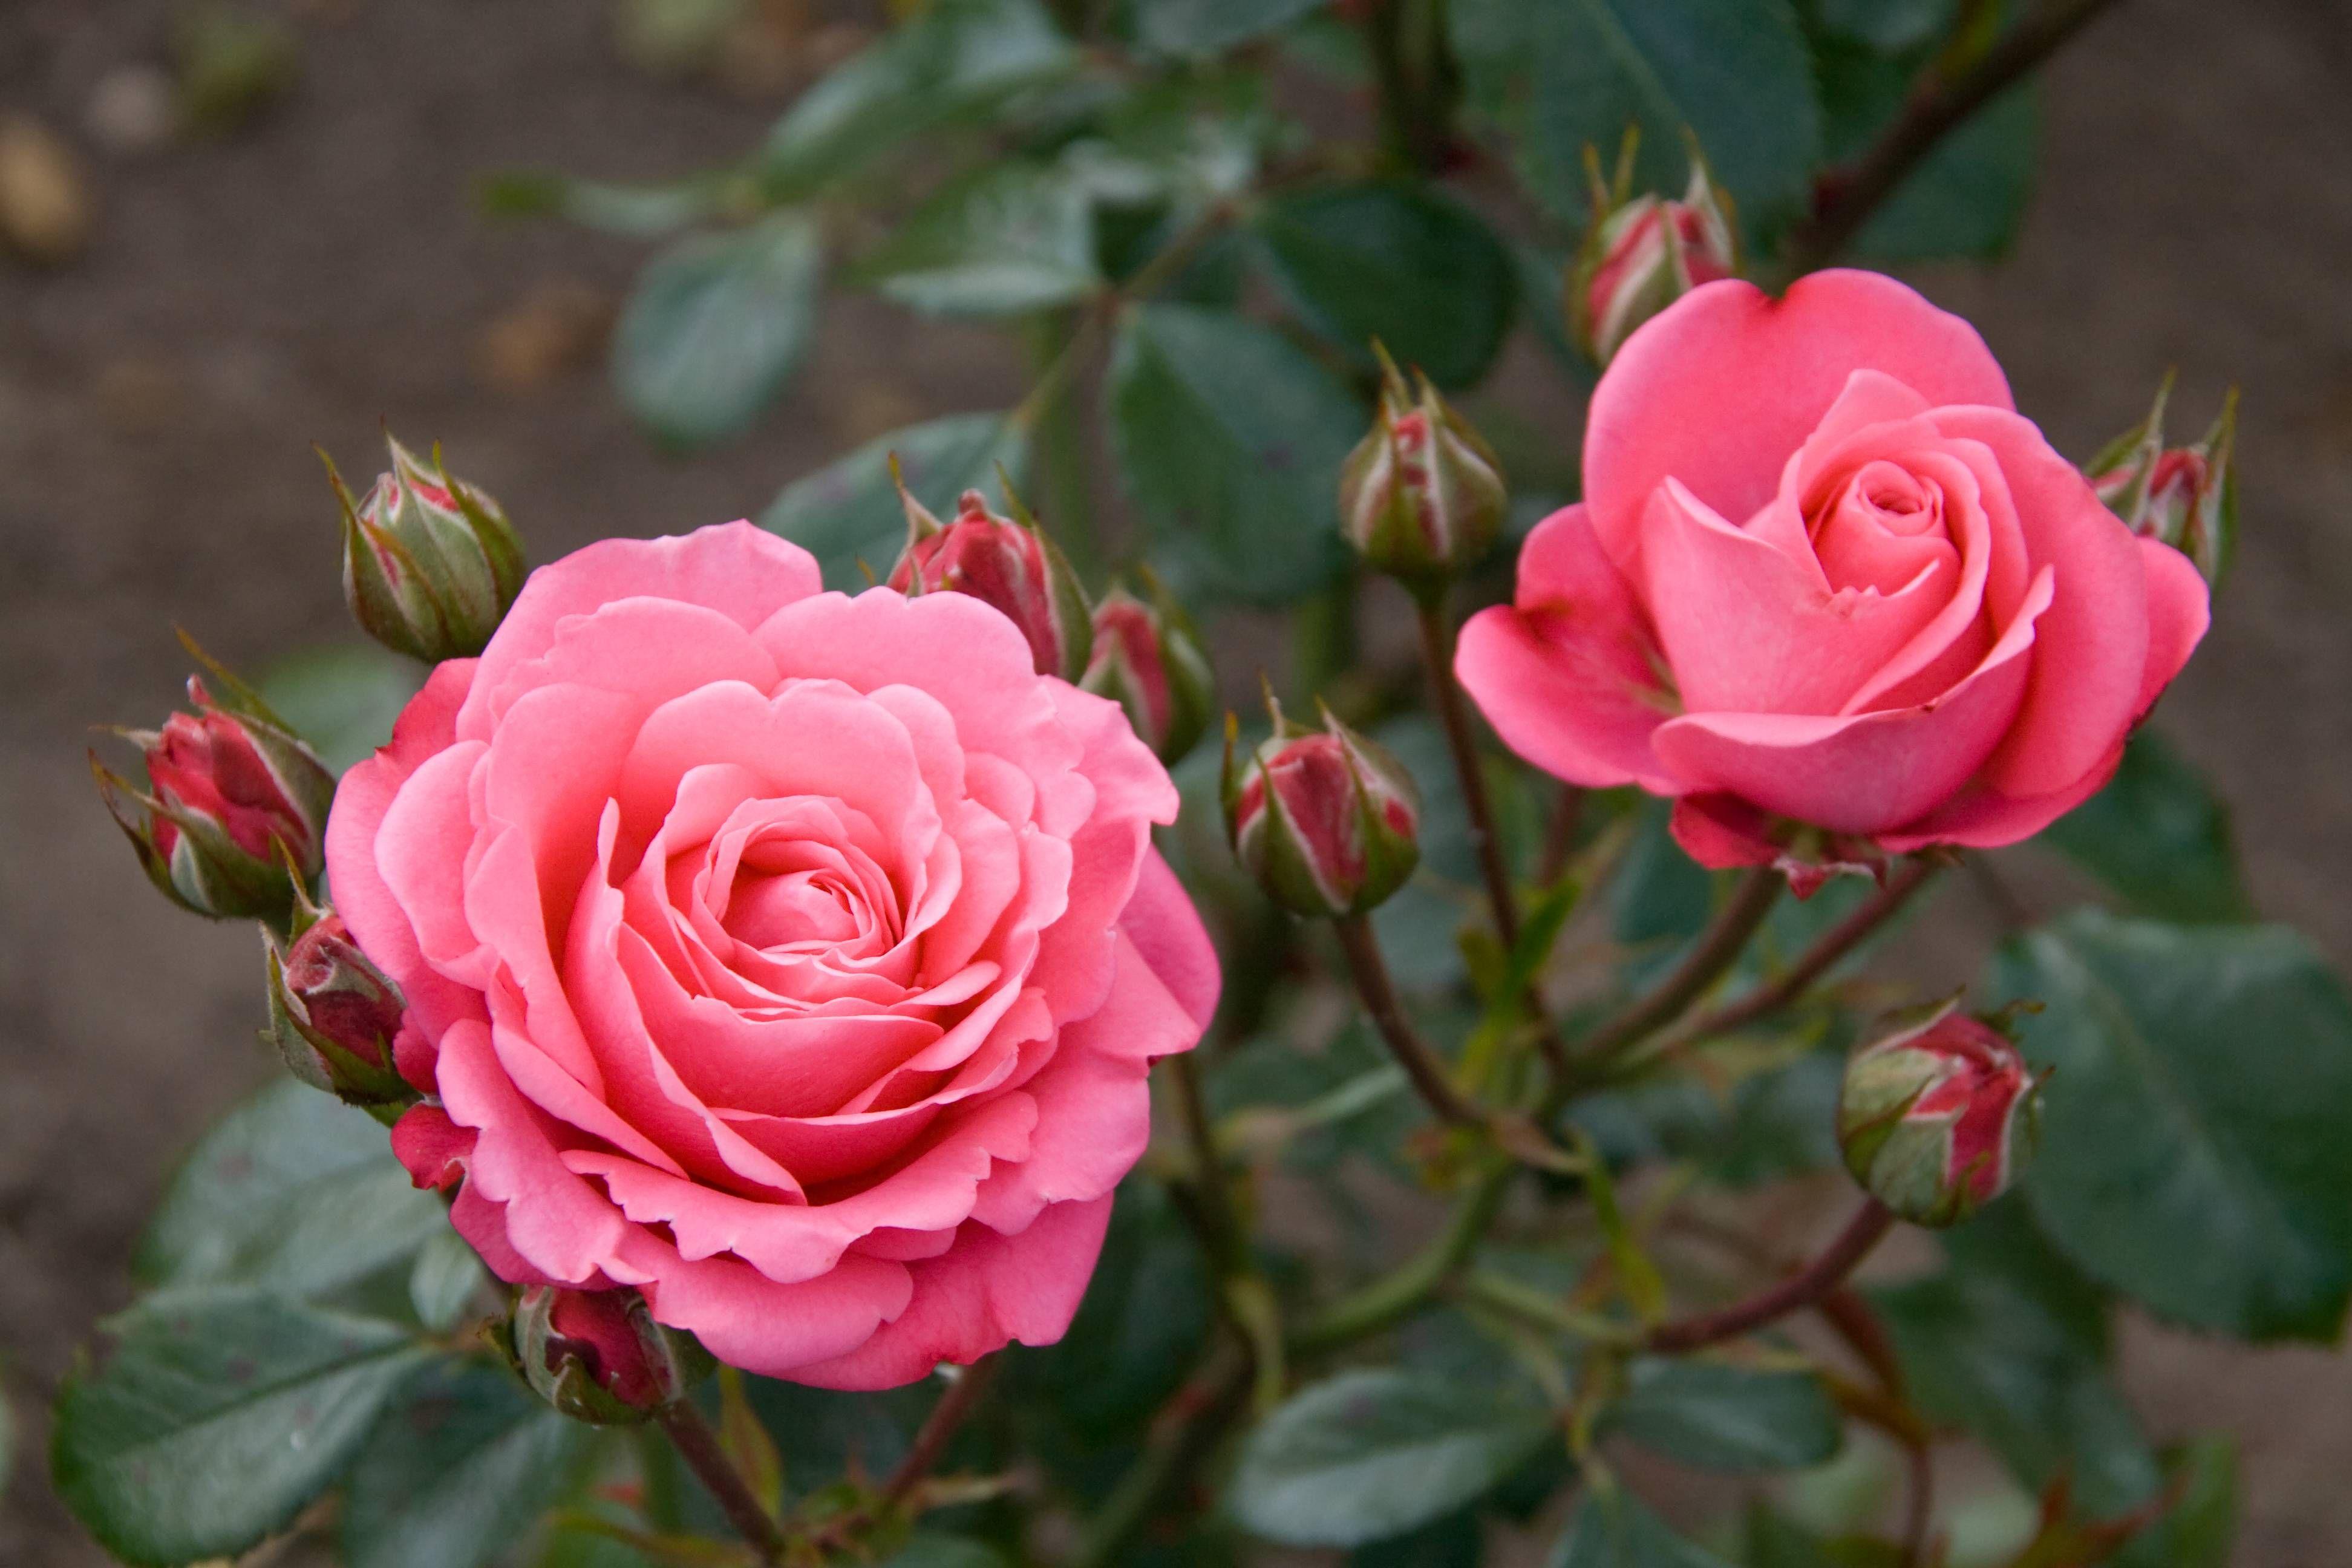 10 Ways To Improve Your Garden With Epsom Salt (With